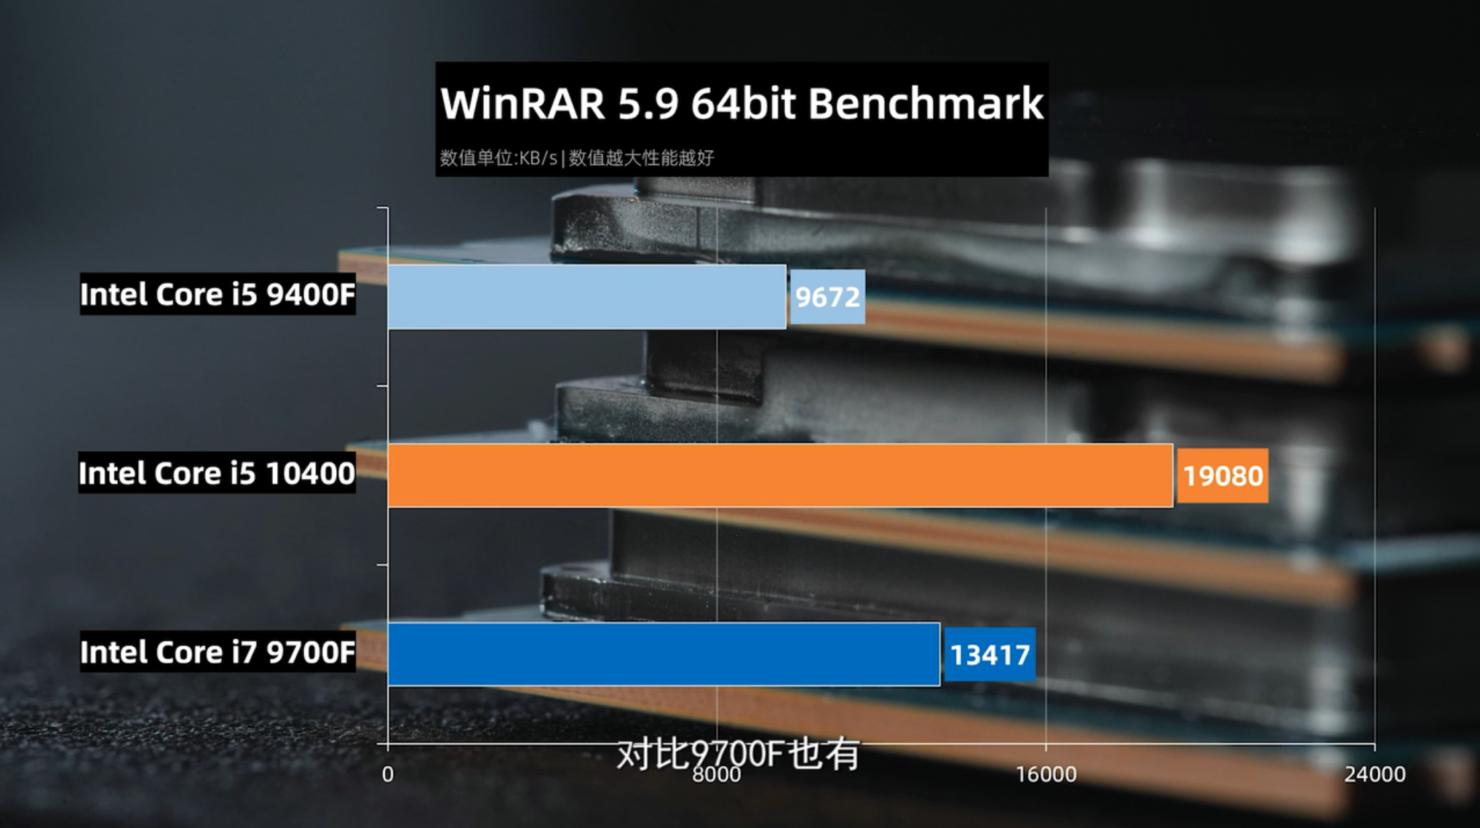 intel-core-i5-10400-comet-lake-s-6-core-desktop-cpu_winrar